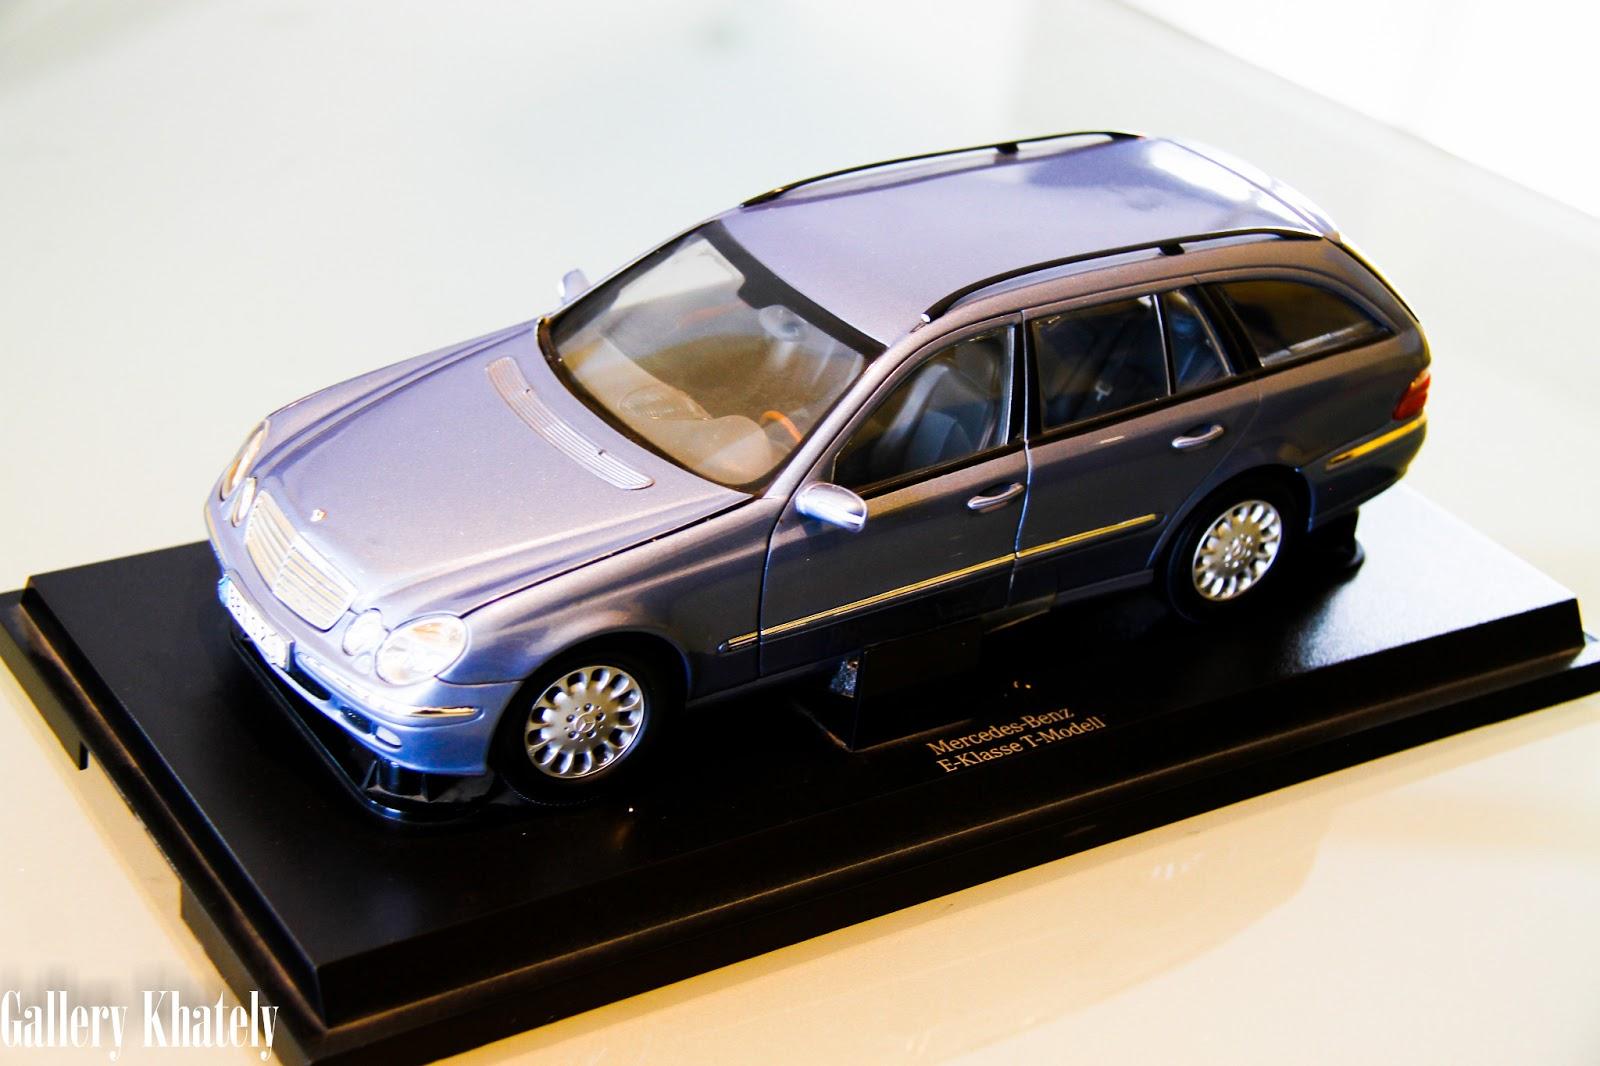 TOYS FOR BOYS Mercedes Benz DT DOBIE KENYA | GALLERY-KHATELY®